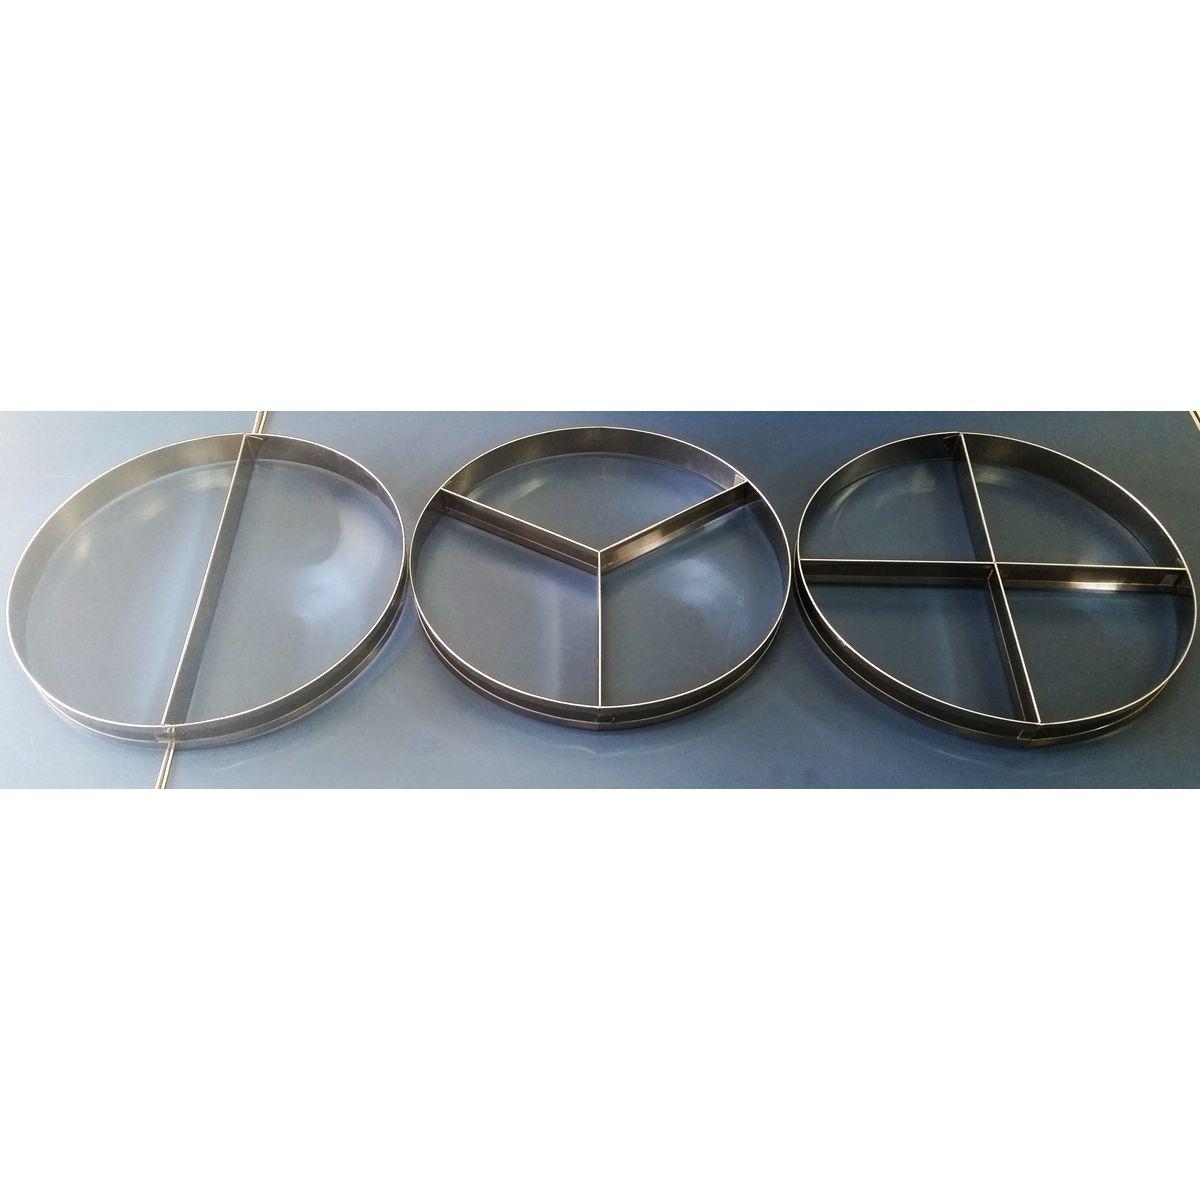 APARTADORES - 2, 3 e 4 SABORES INOX. P/PIZZAS DE 40 CM  - Fórum de Pizzas Vendas online